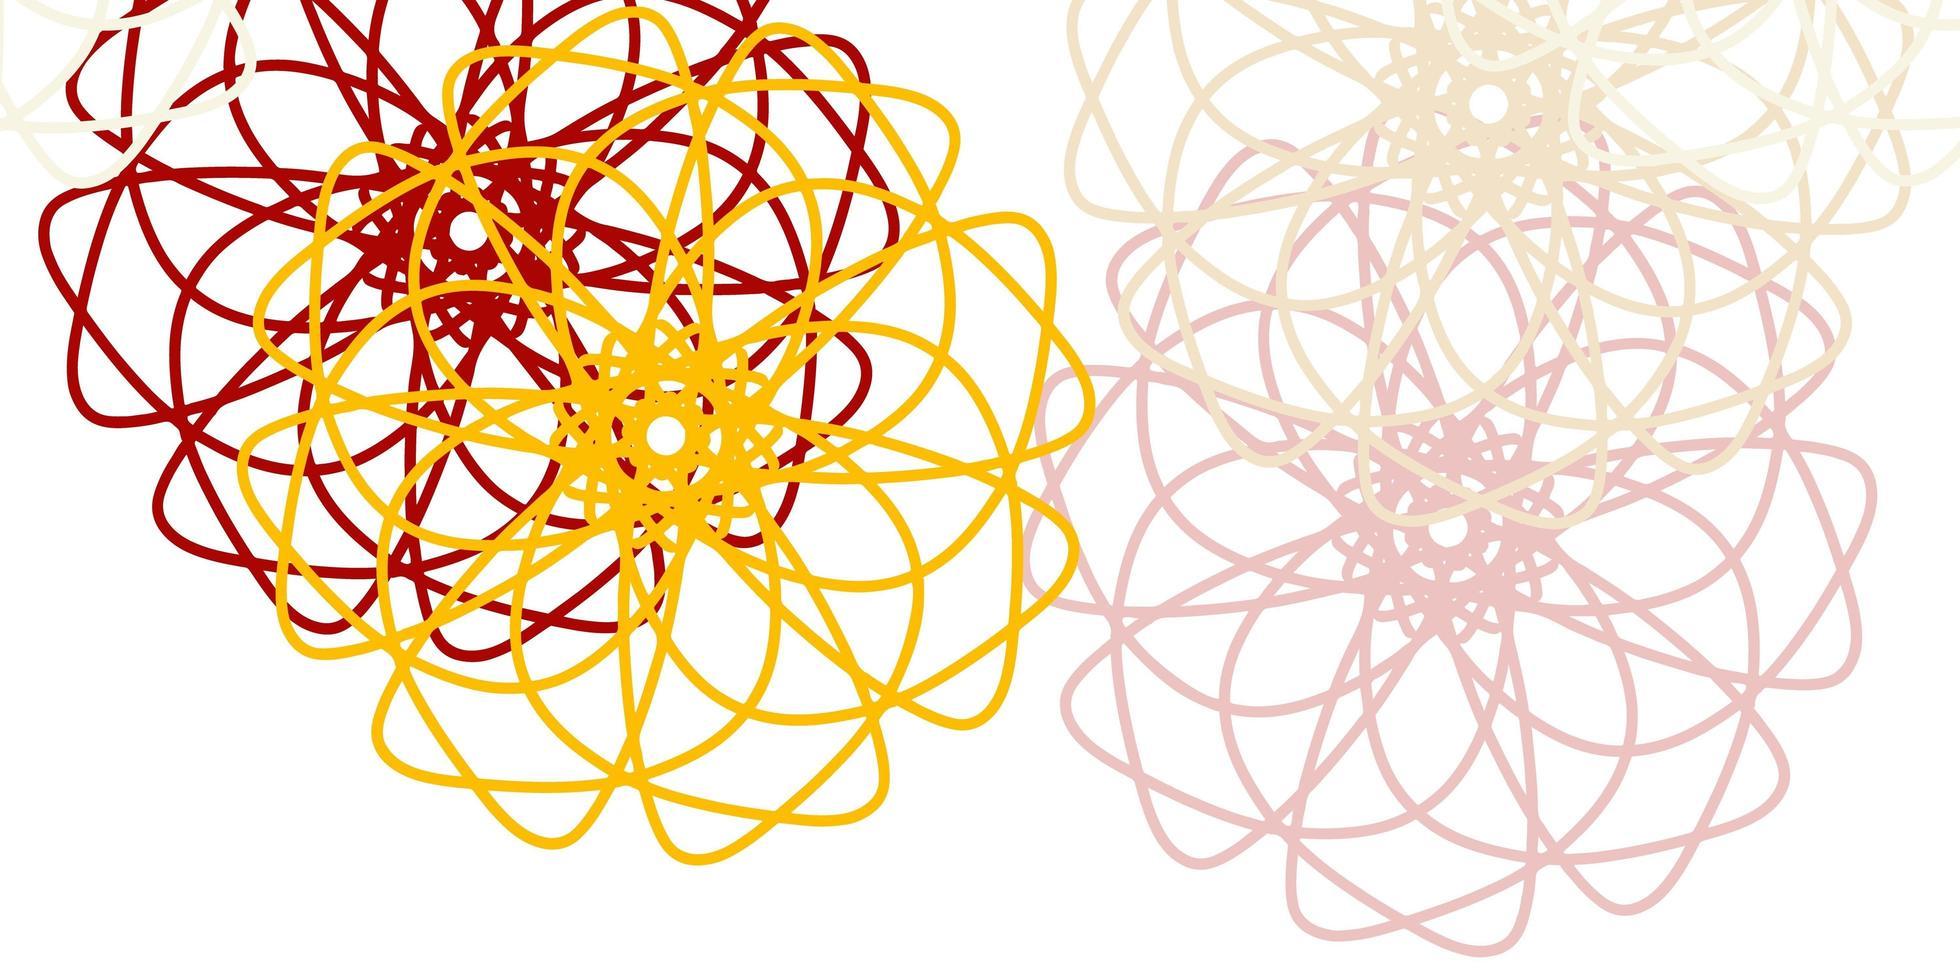 hellorange Vektor Gekritzel Textur mit Blumen.